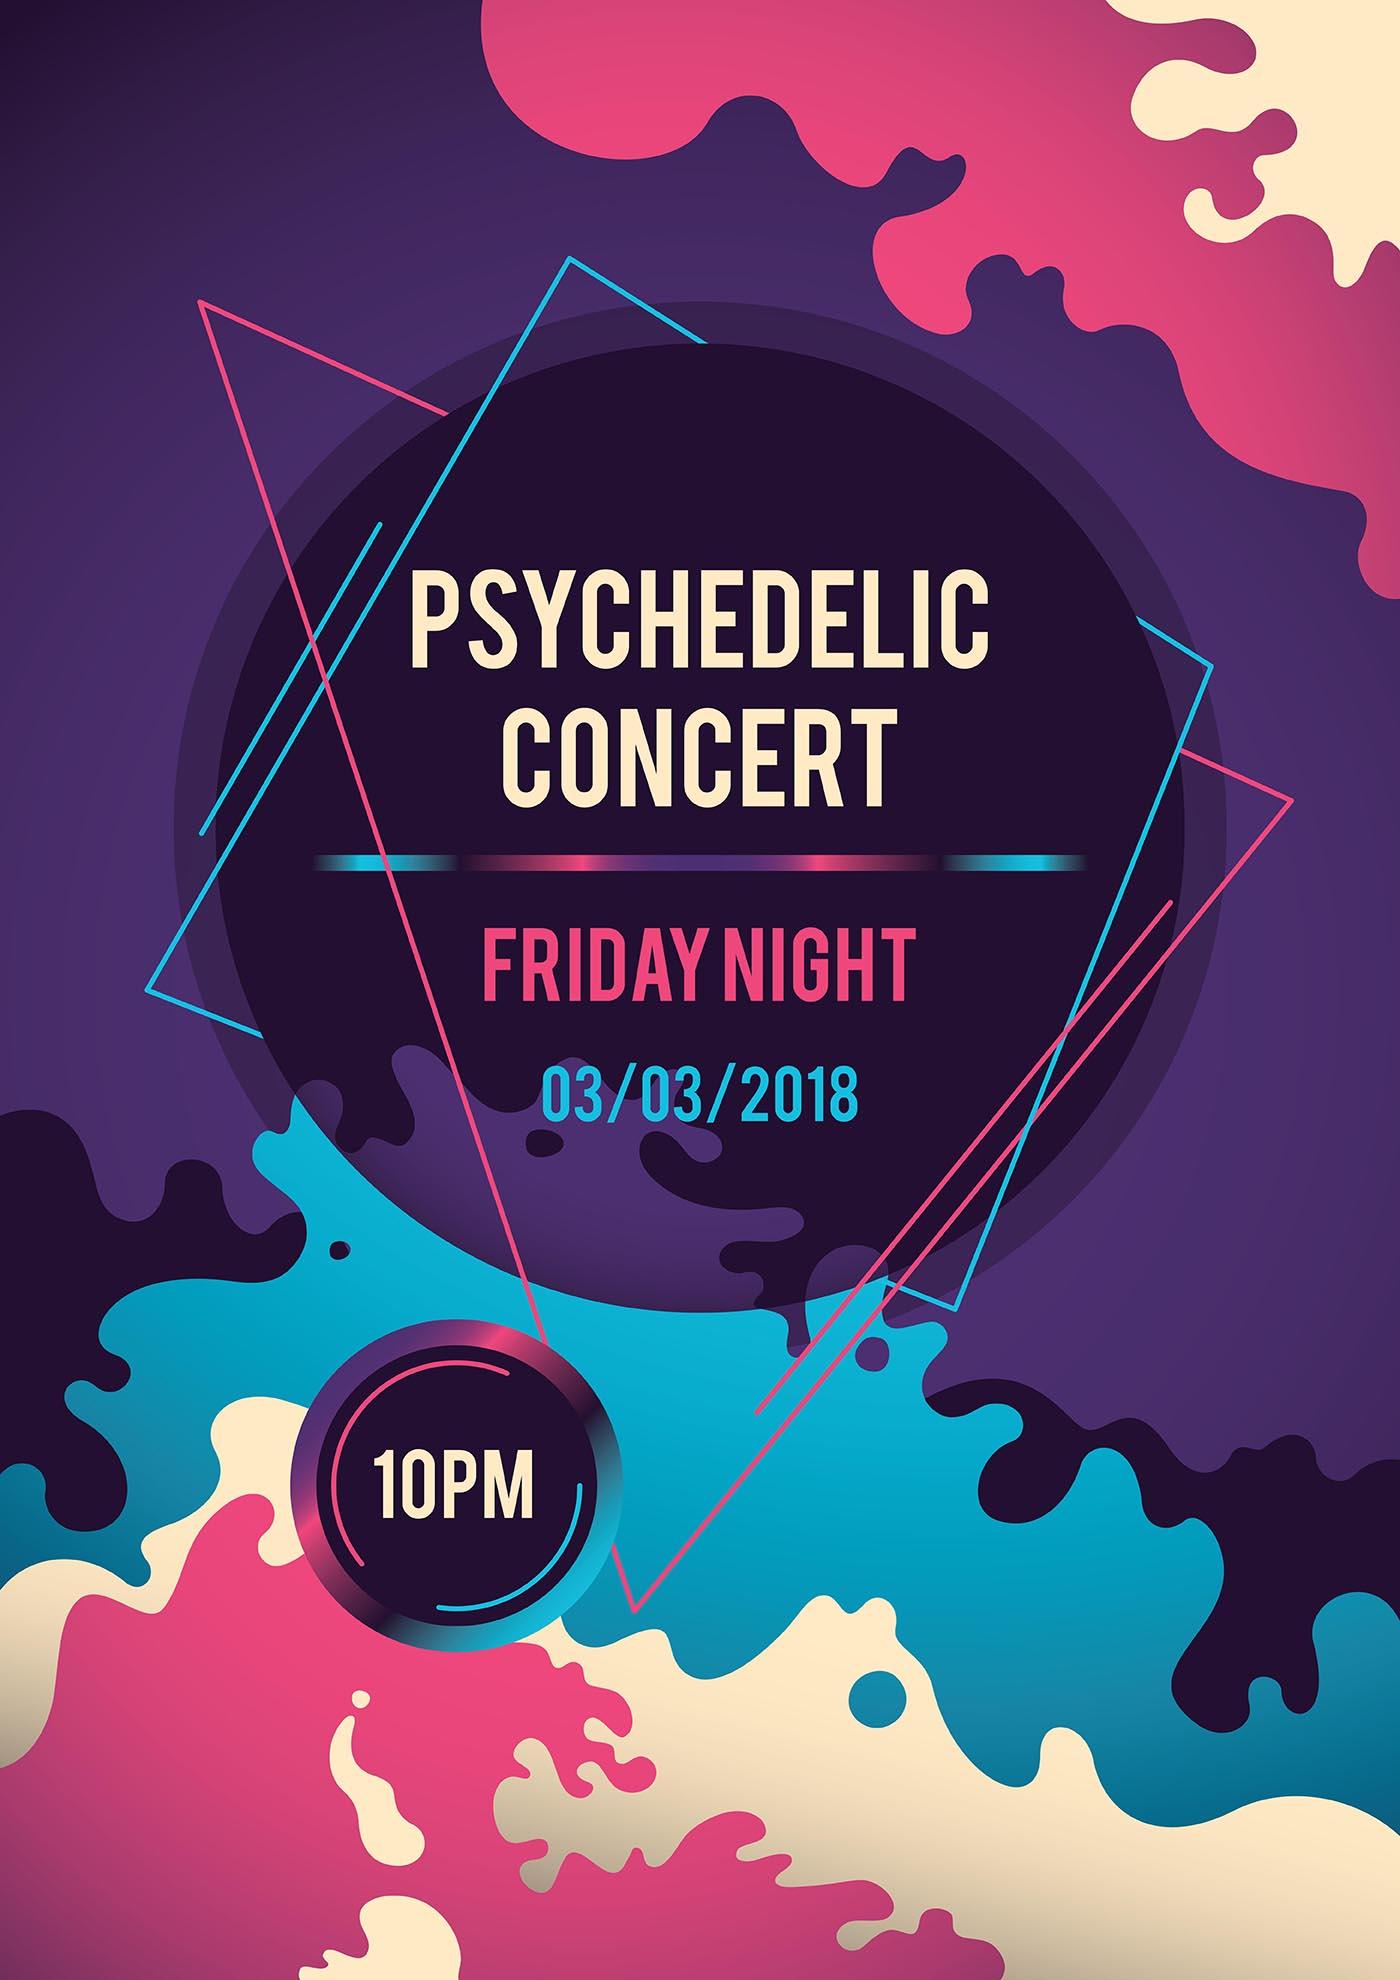 Psychedelic Concert Poster Download Free Vectors